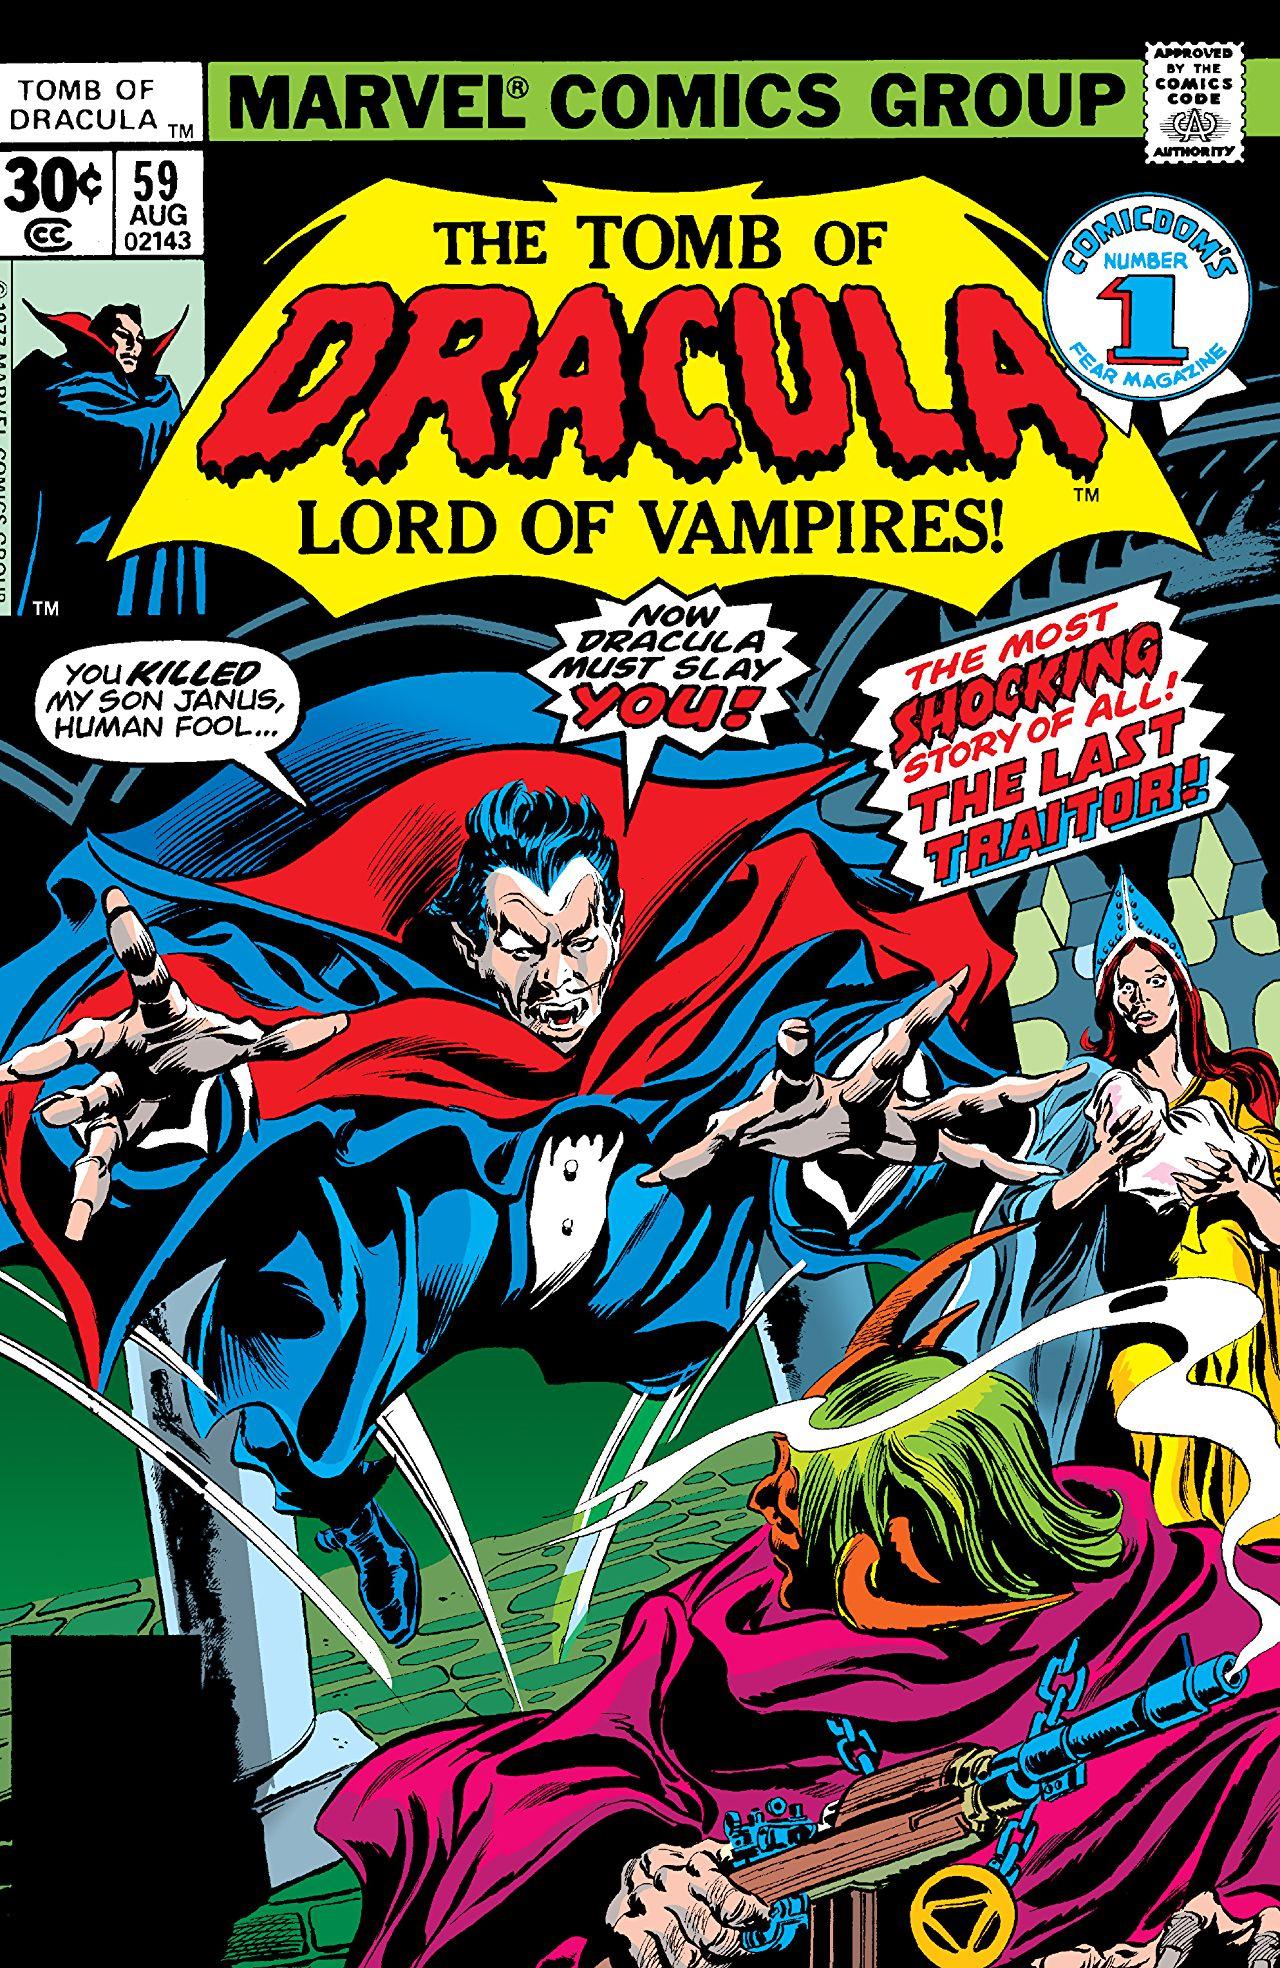 Tomb of Dracula 59